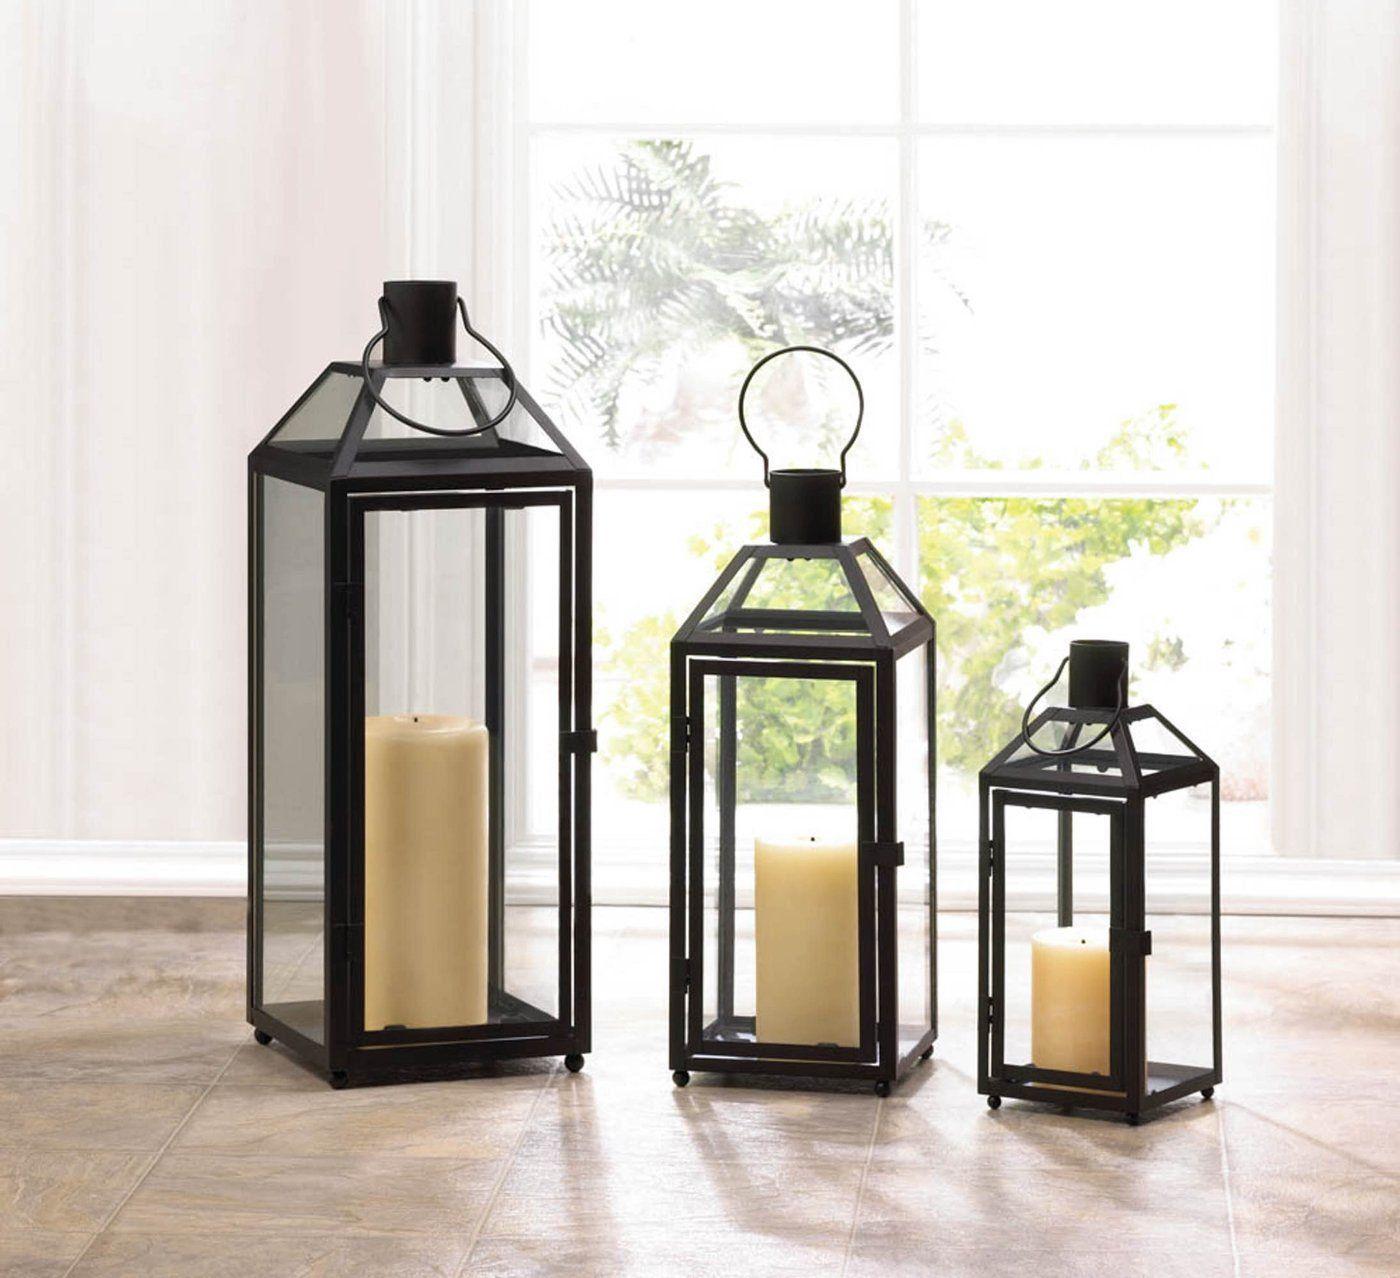 Jackson Metal Lantern Magnolia Lantern Decor Living Home Decor Vases Floor Lanterns